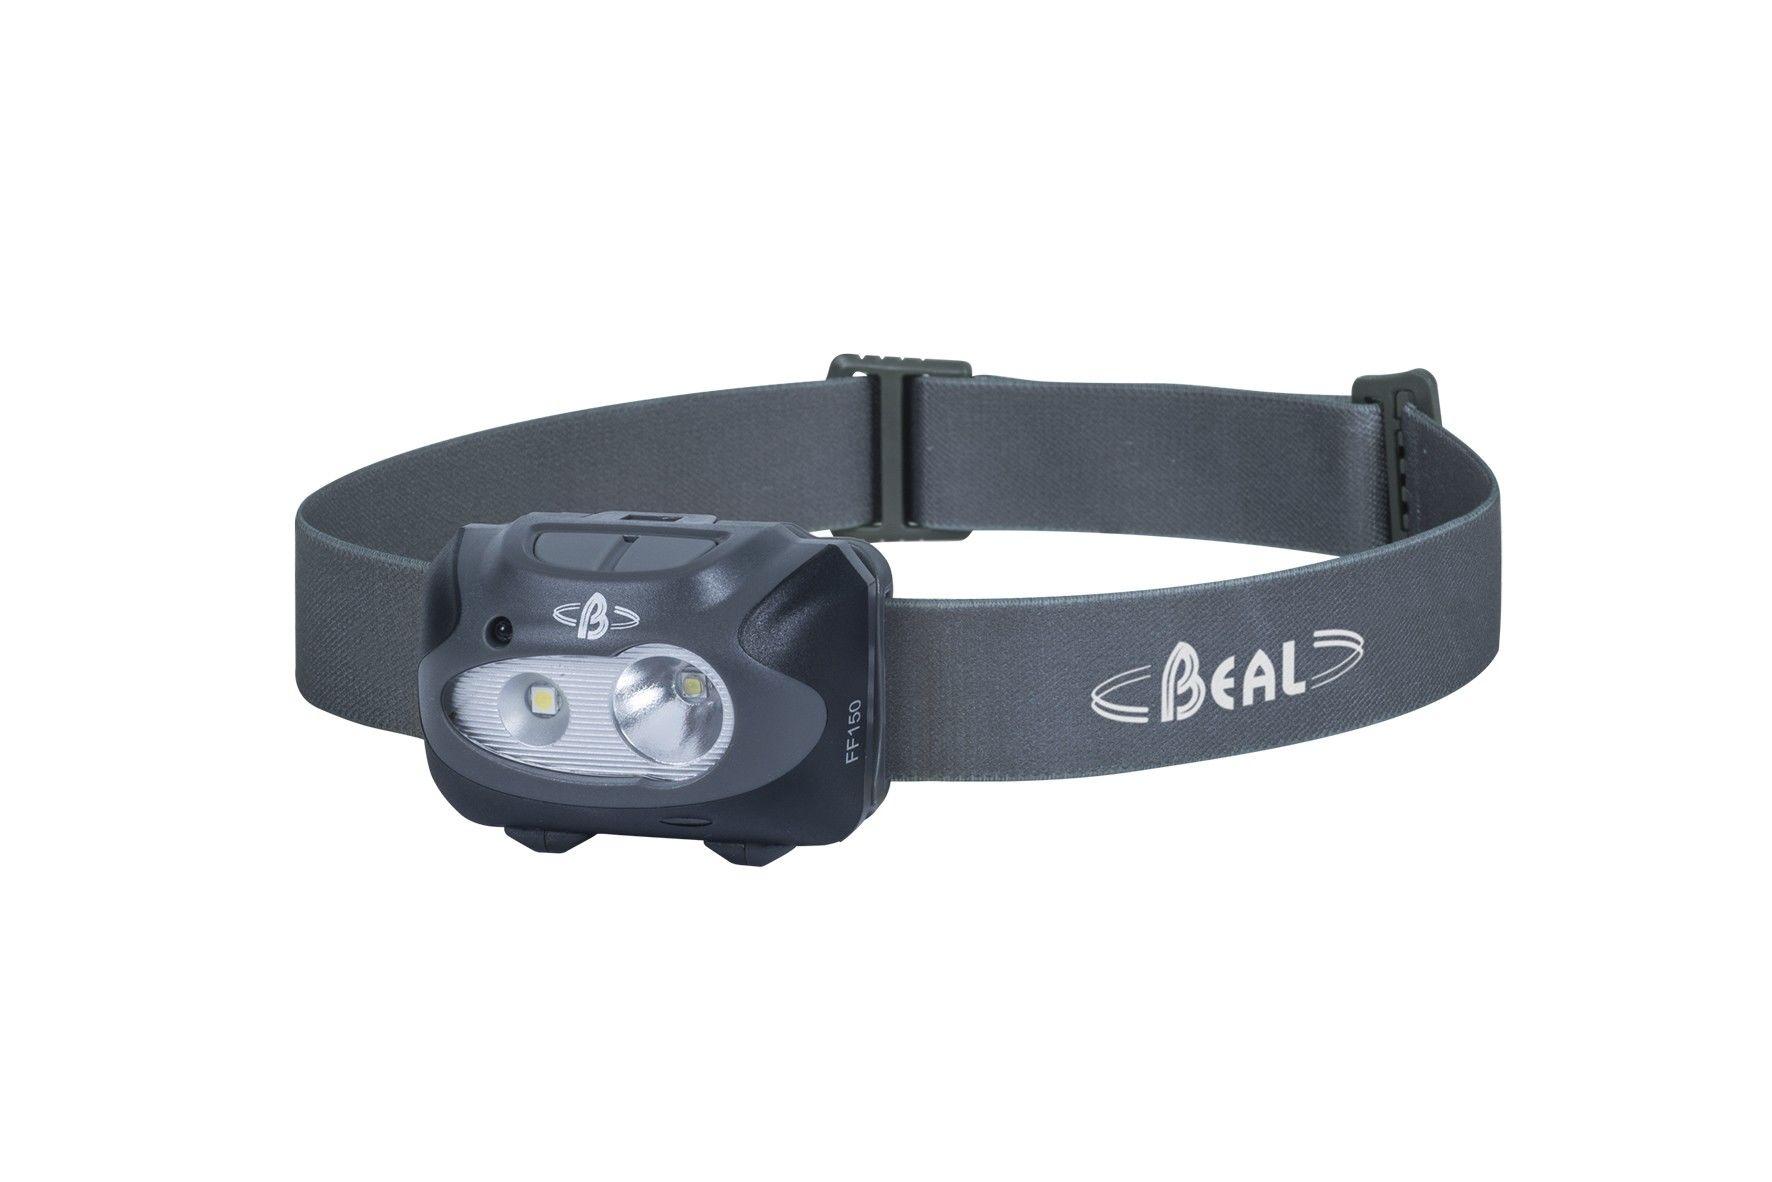 Beal Ff150 Grau, One Size -Farbe Grey, One Size